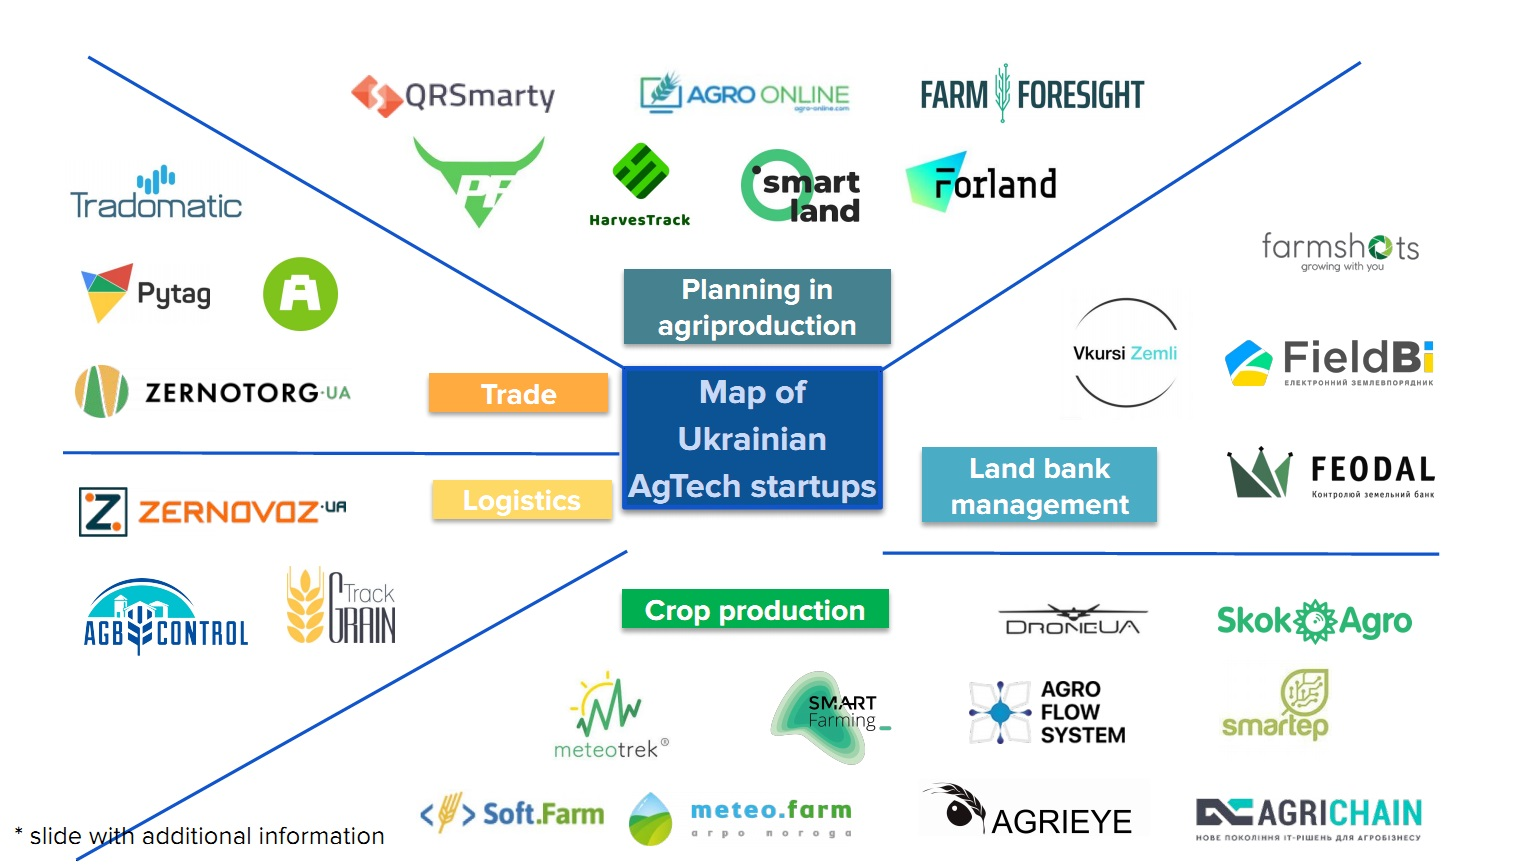 AgTech startups in Ukraine (click for full resolution)